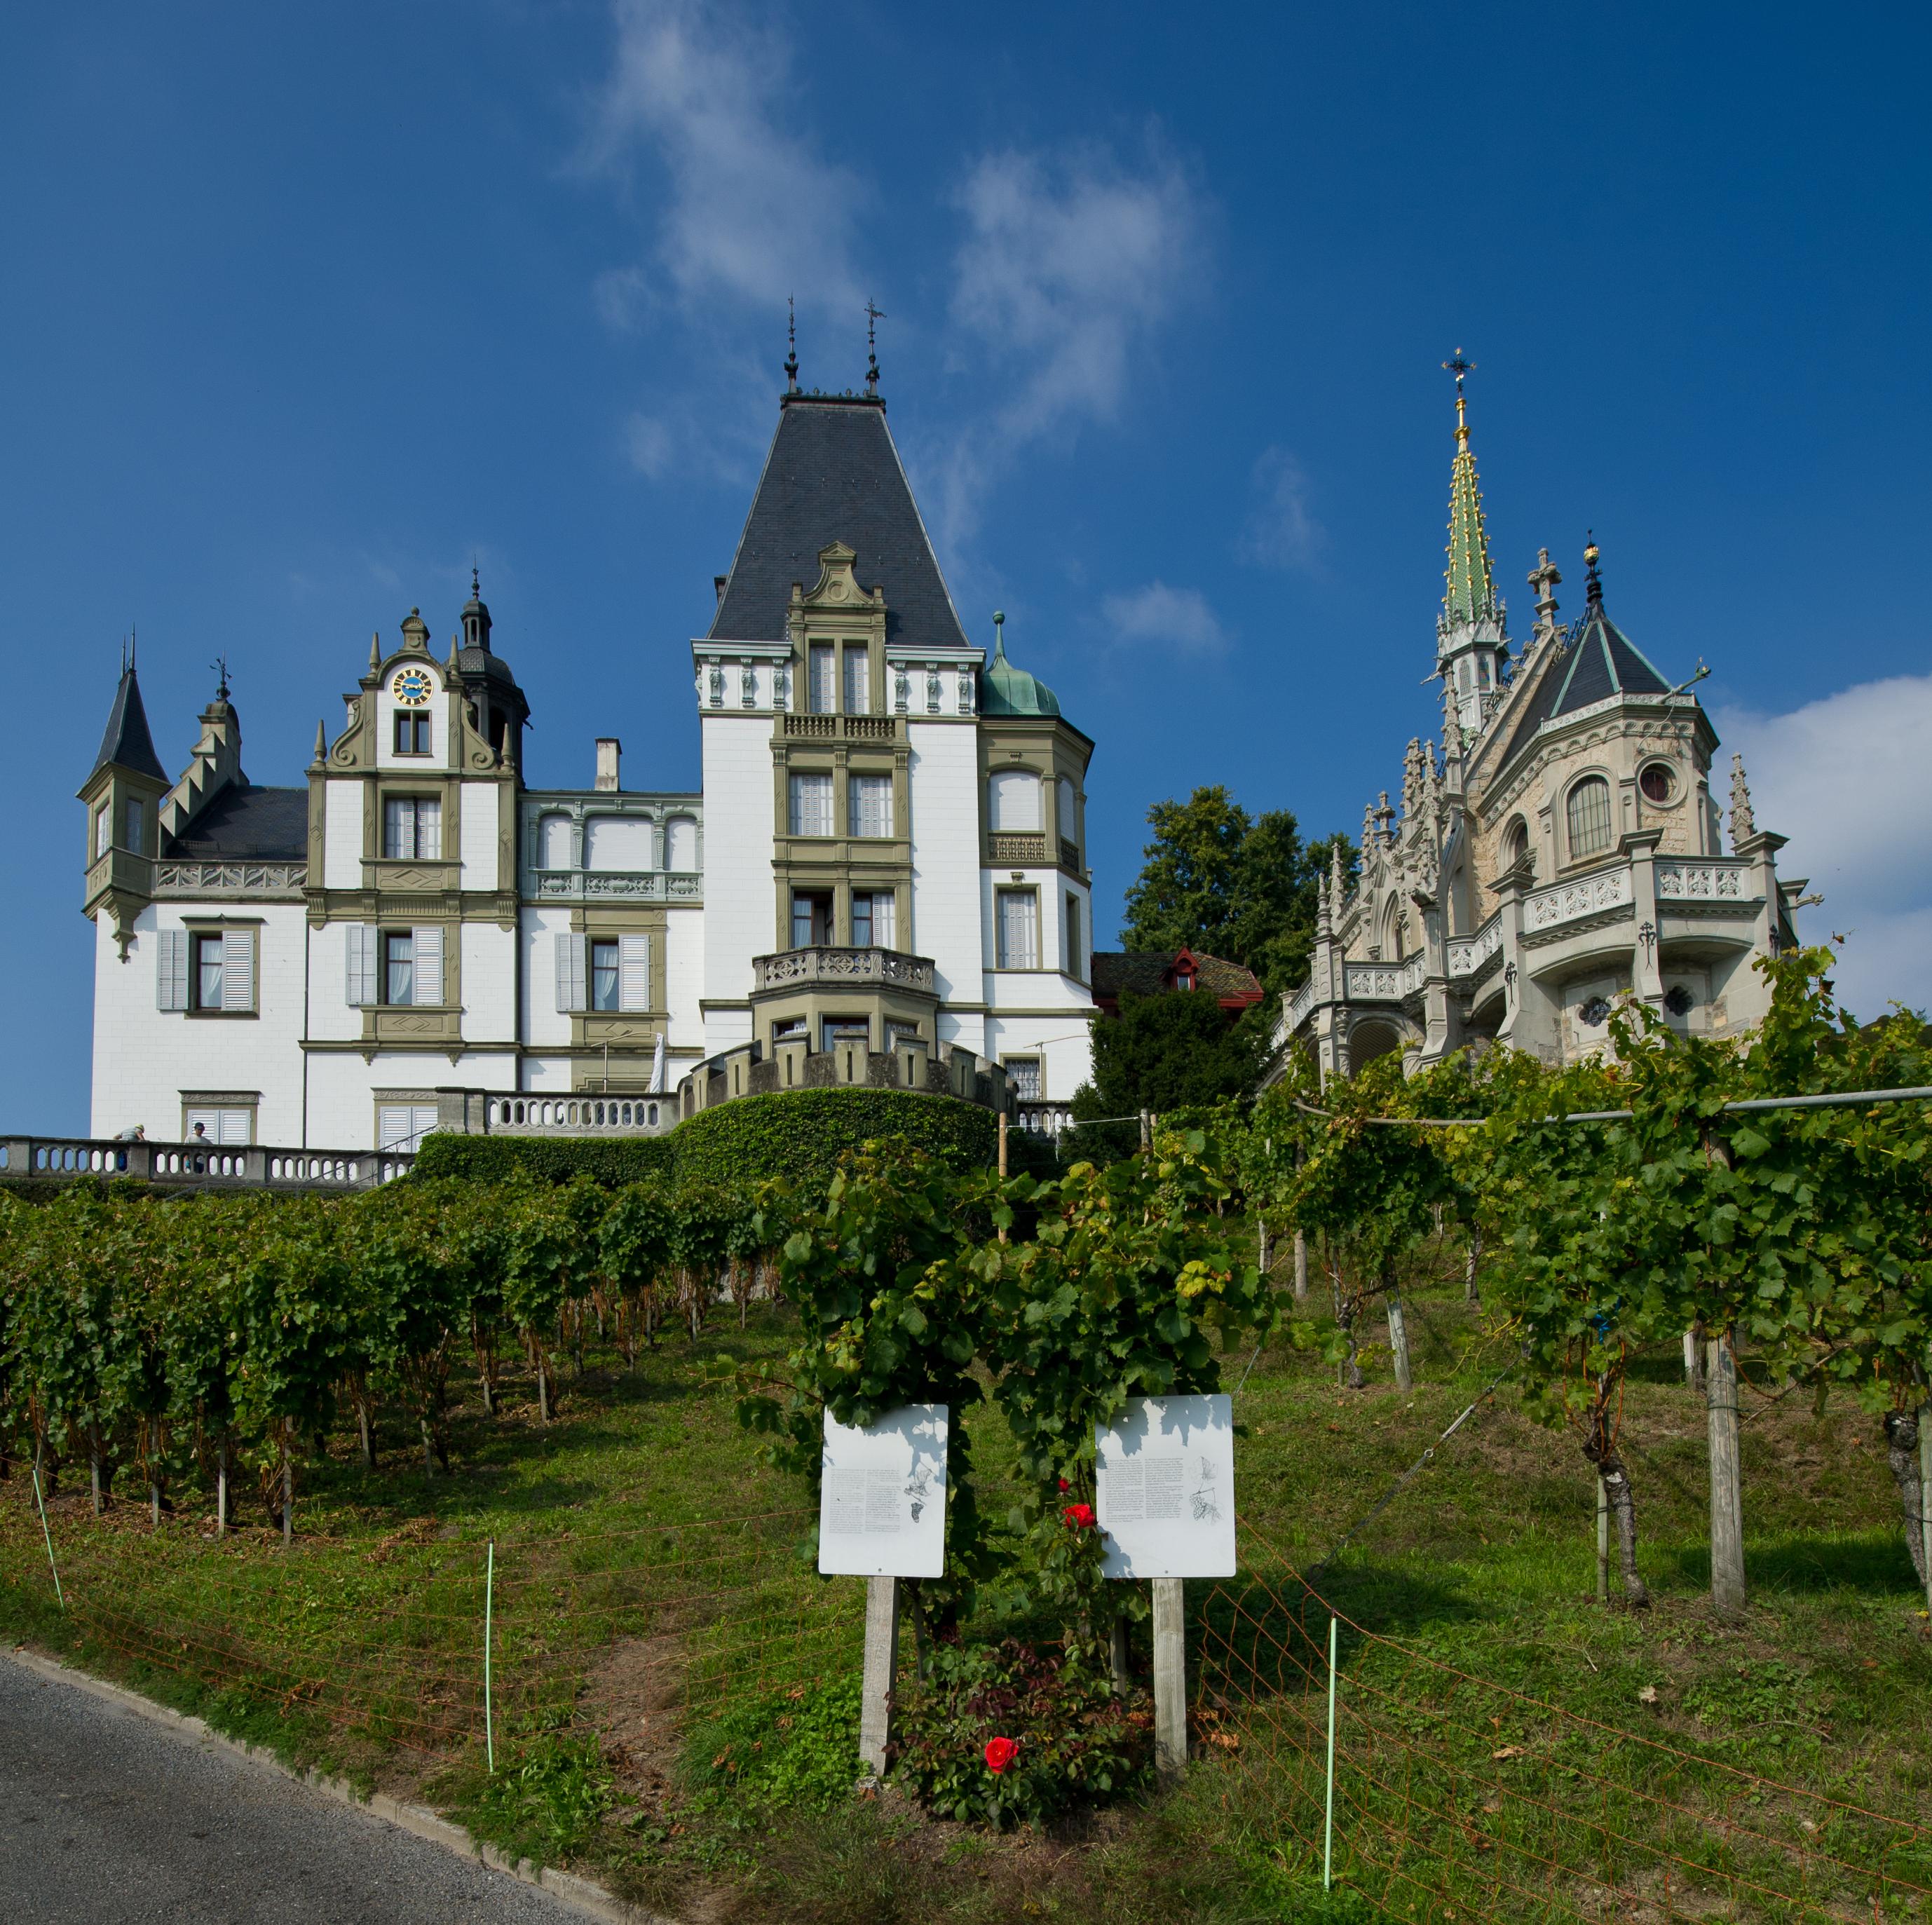 File:Luzern Meggen Schloss Meggenhorn.jpg - Wikimedia Commons